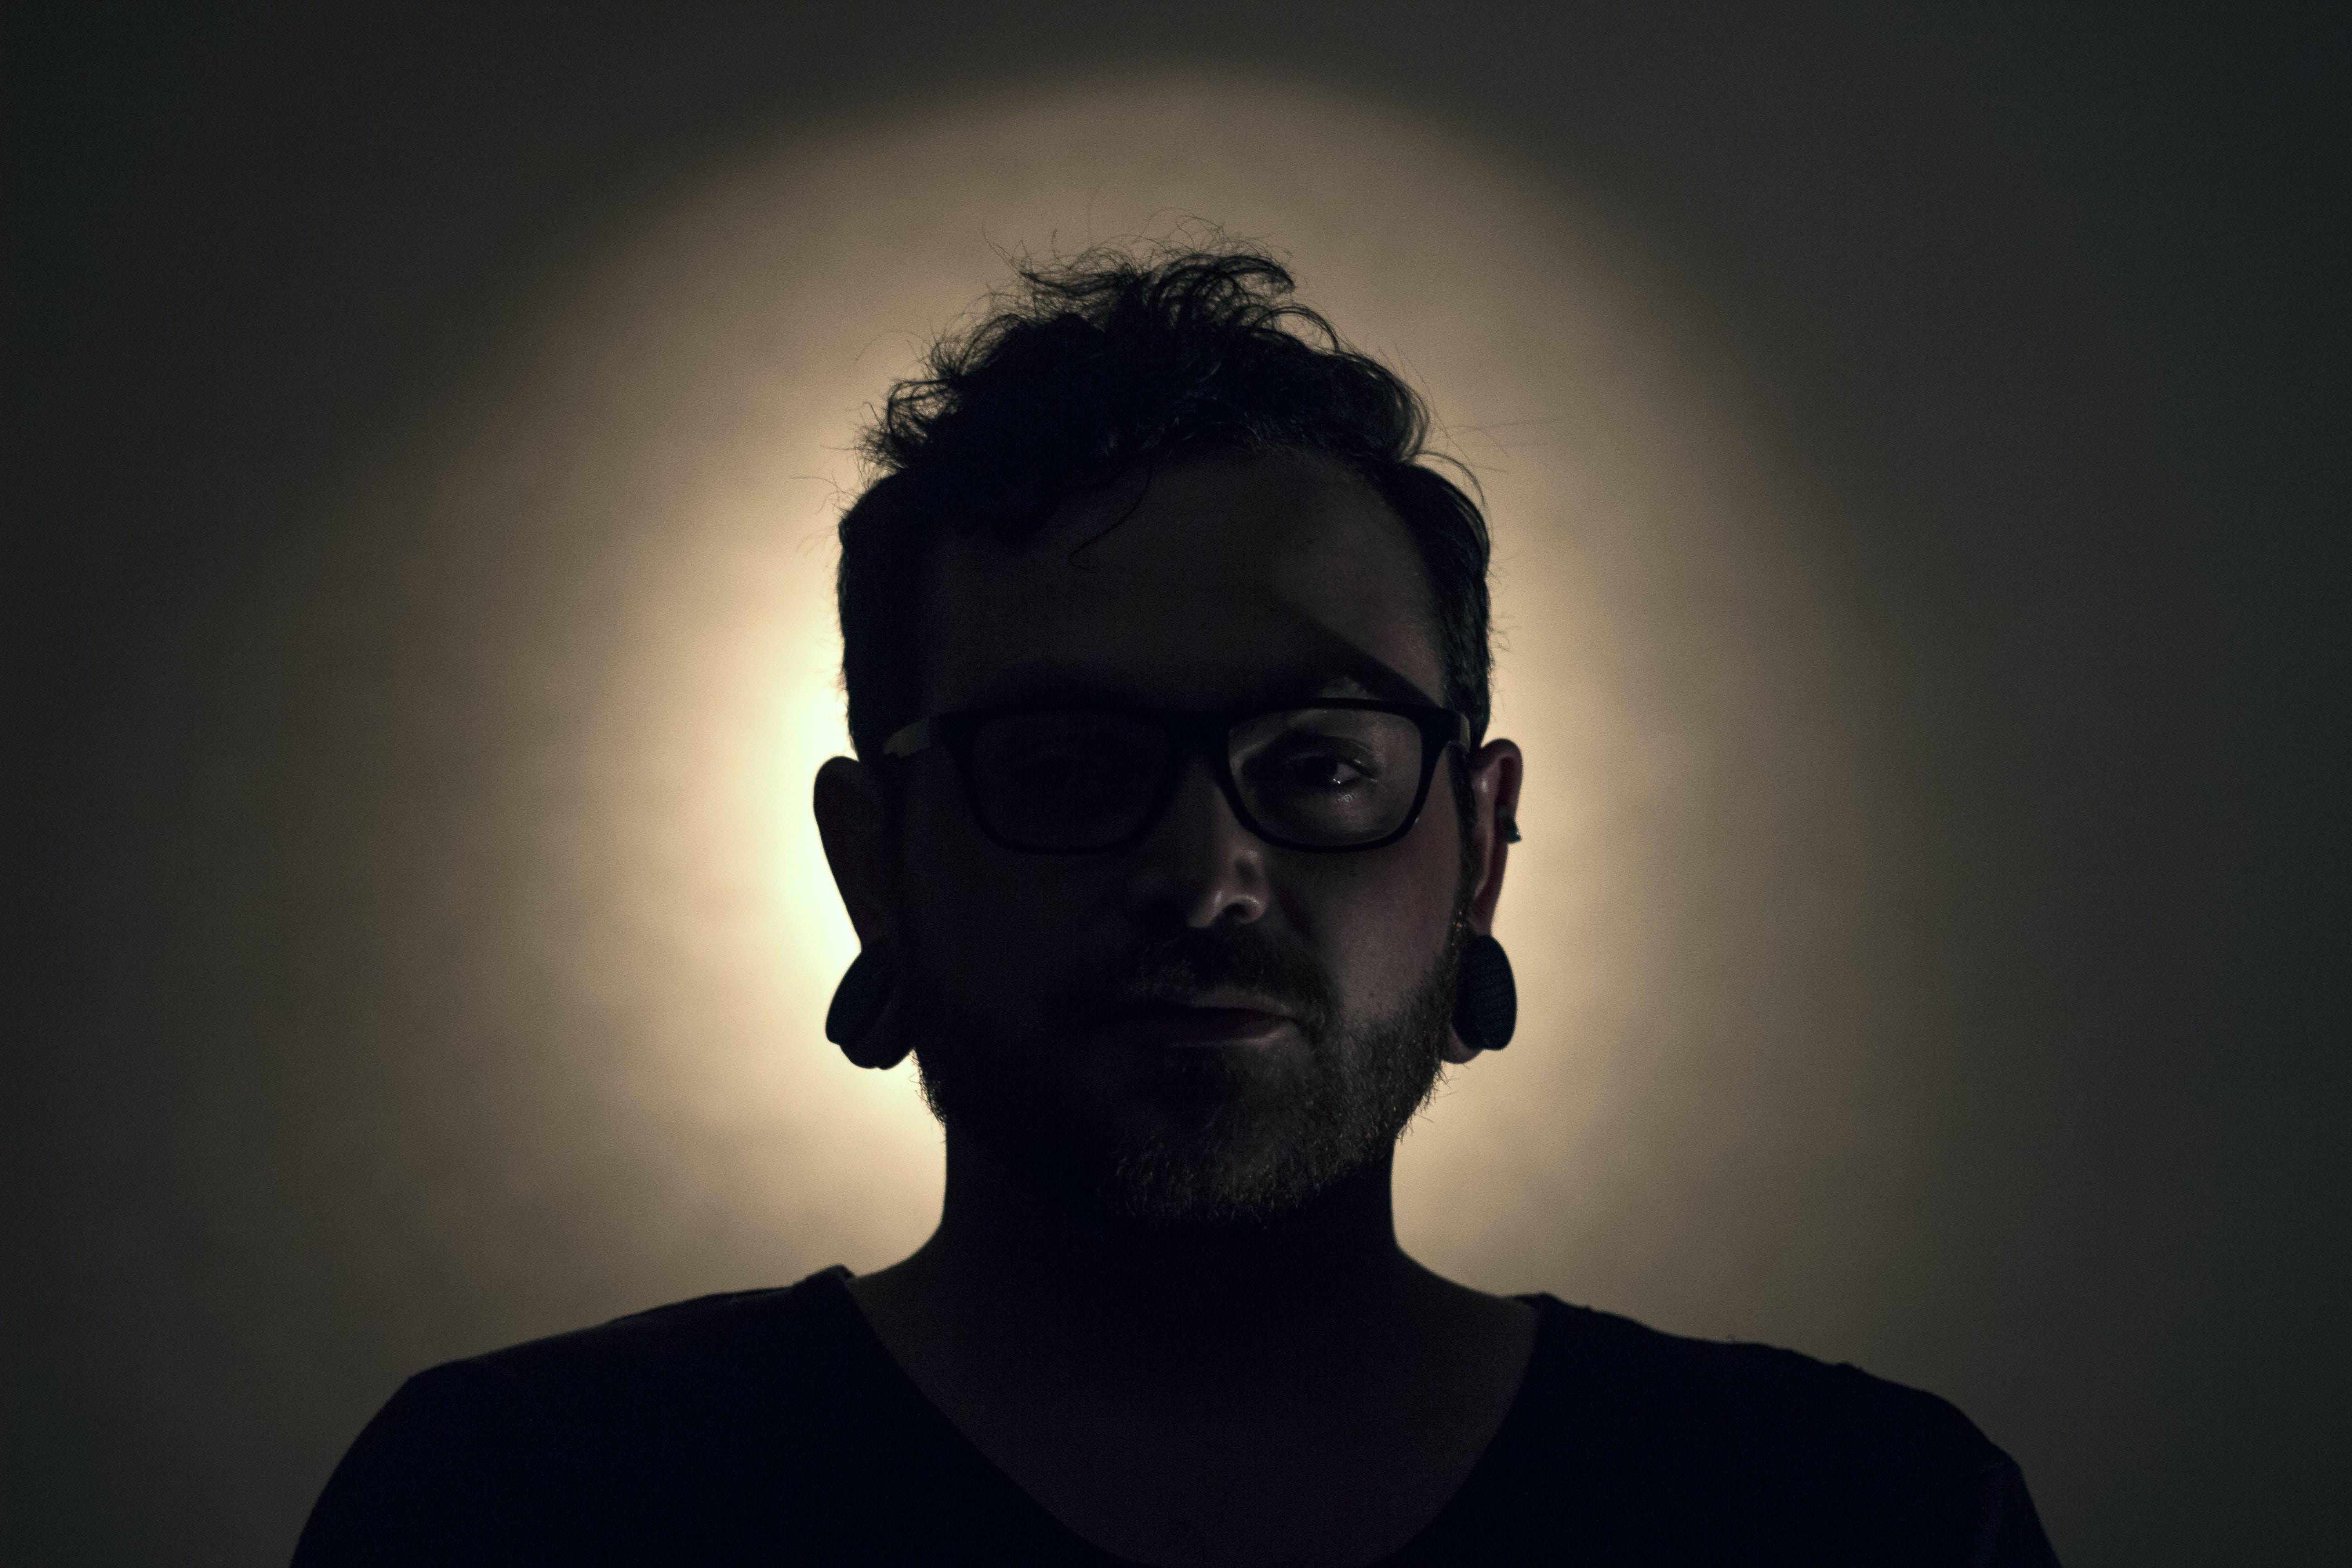 Man Wearing Black Shirt and Black Framed Eyeglasses